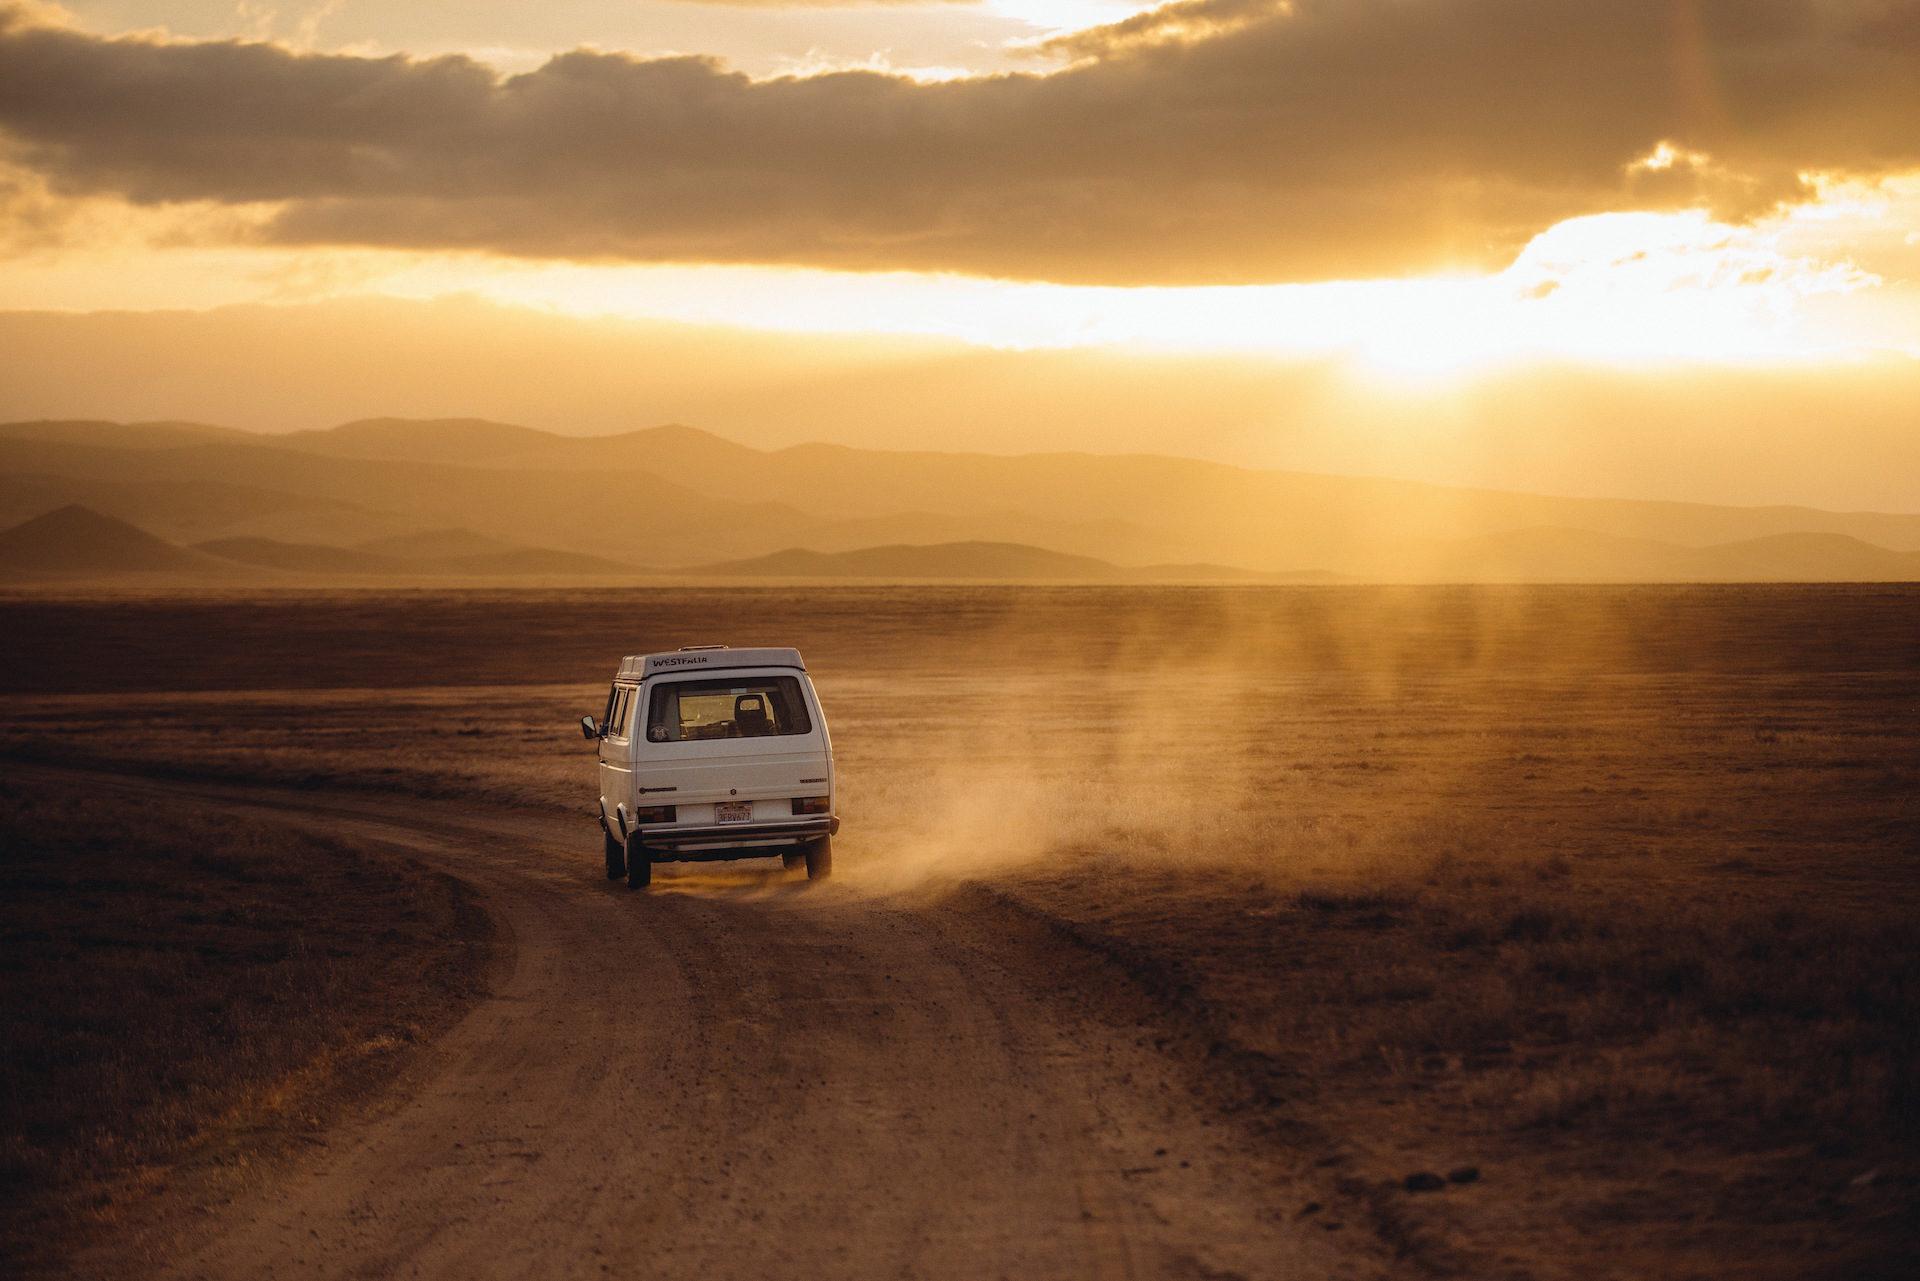 Van, έρημο, Ηλιοβασίλεμα, Άμμος, σκόνη - Wallpapers HD - Professor-falken.com